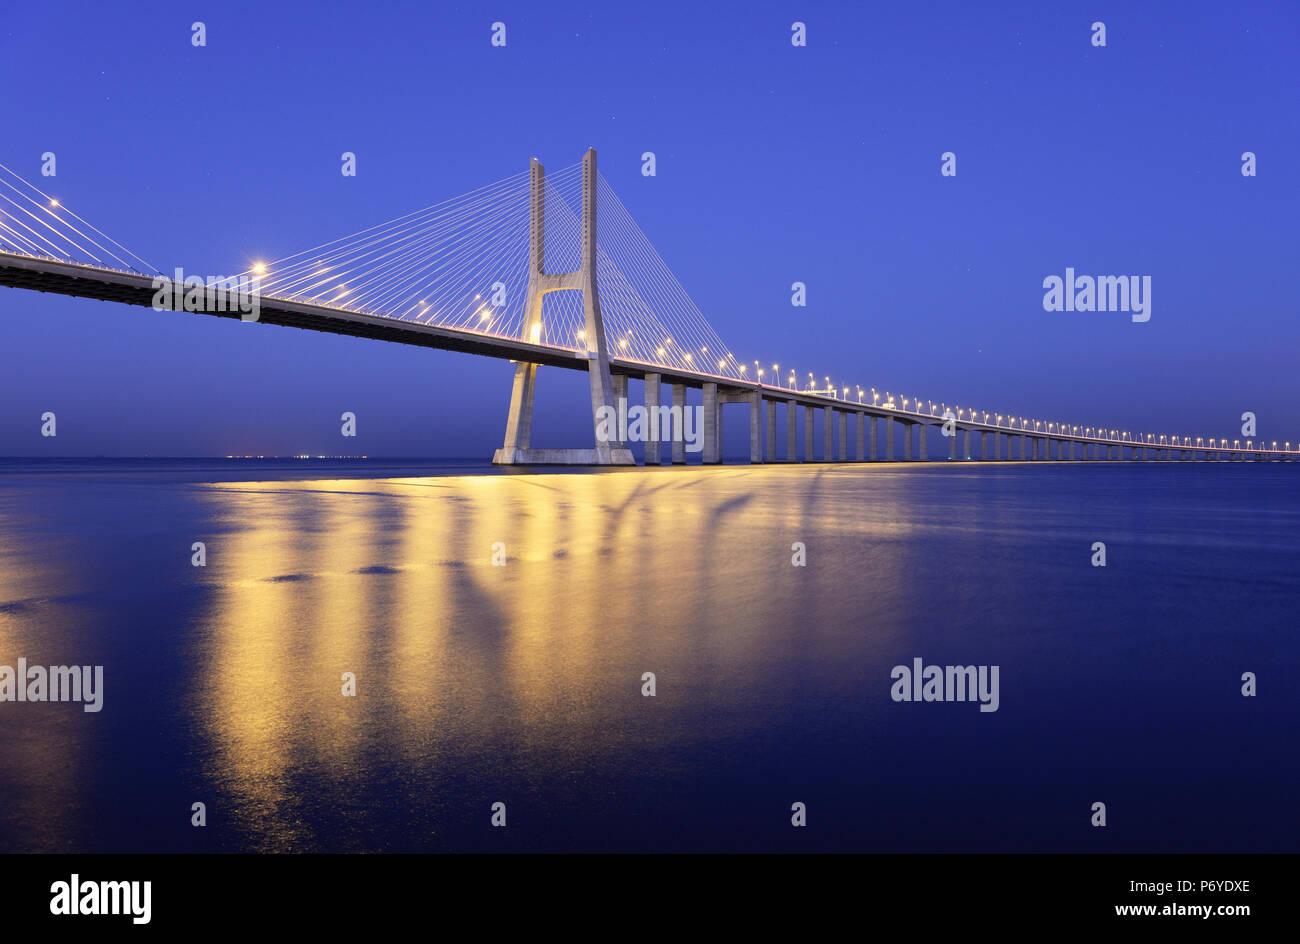 Vasco da Gama Bridge over the Tagus river (Tejo river), the longest bridge in Europe. Lisbon, Portugal - Stock Image